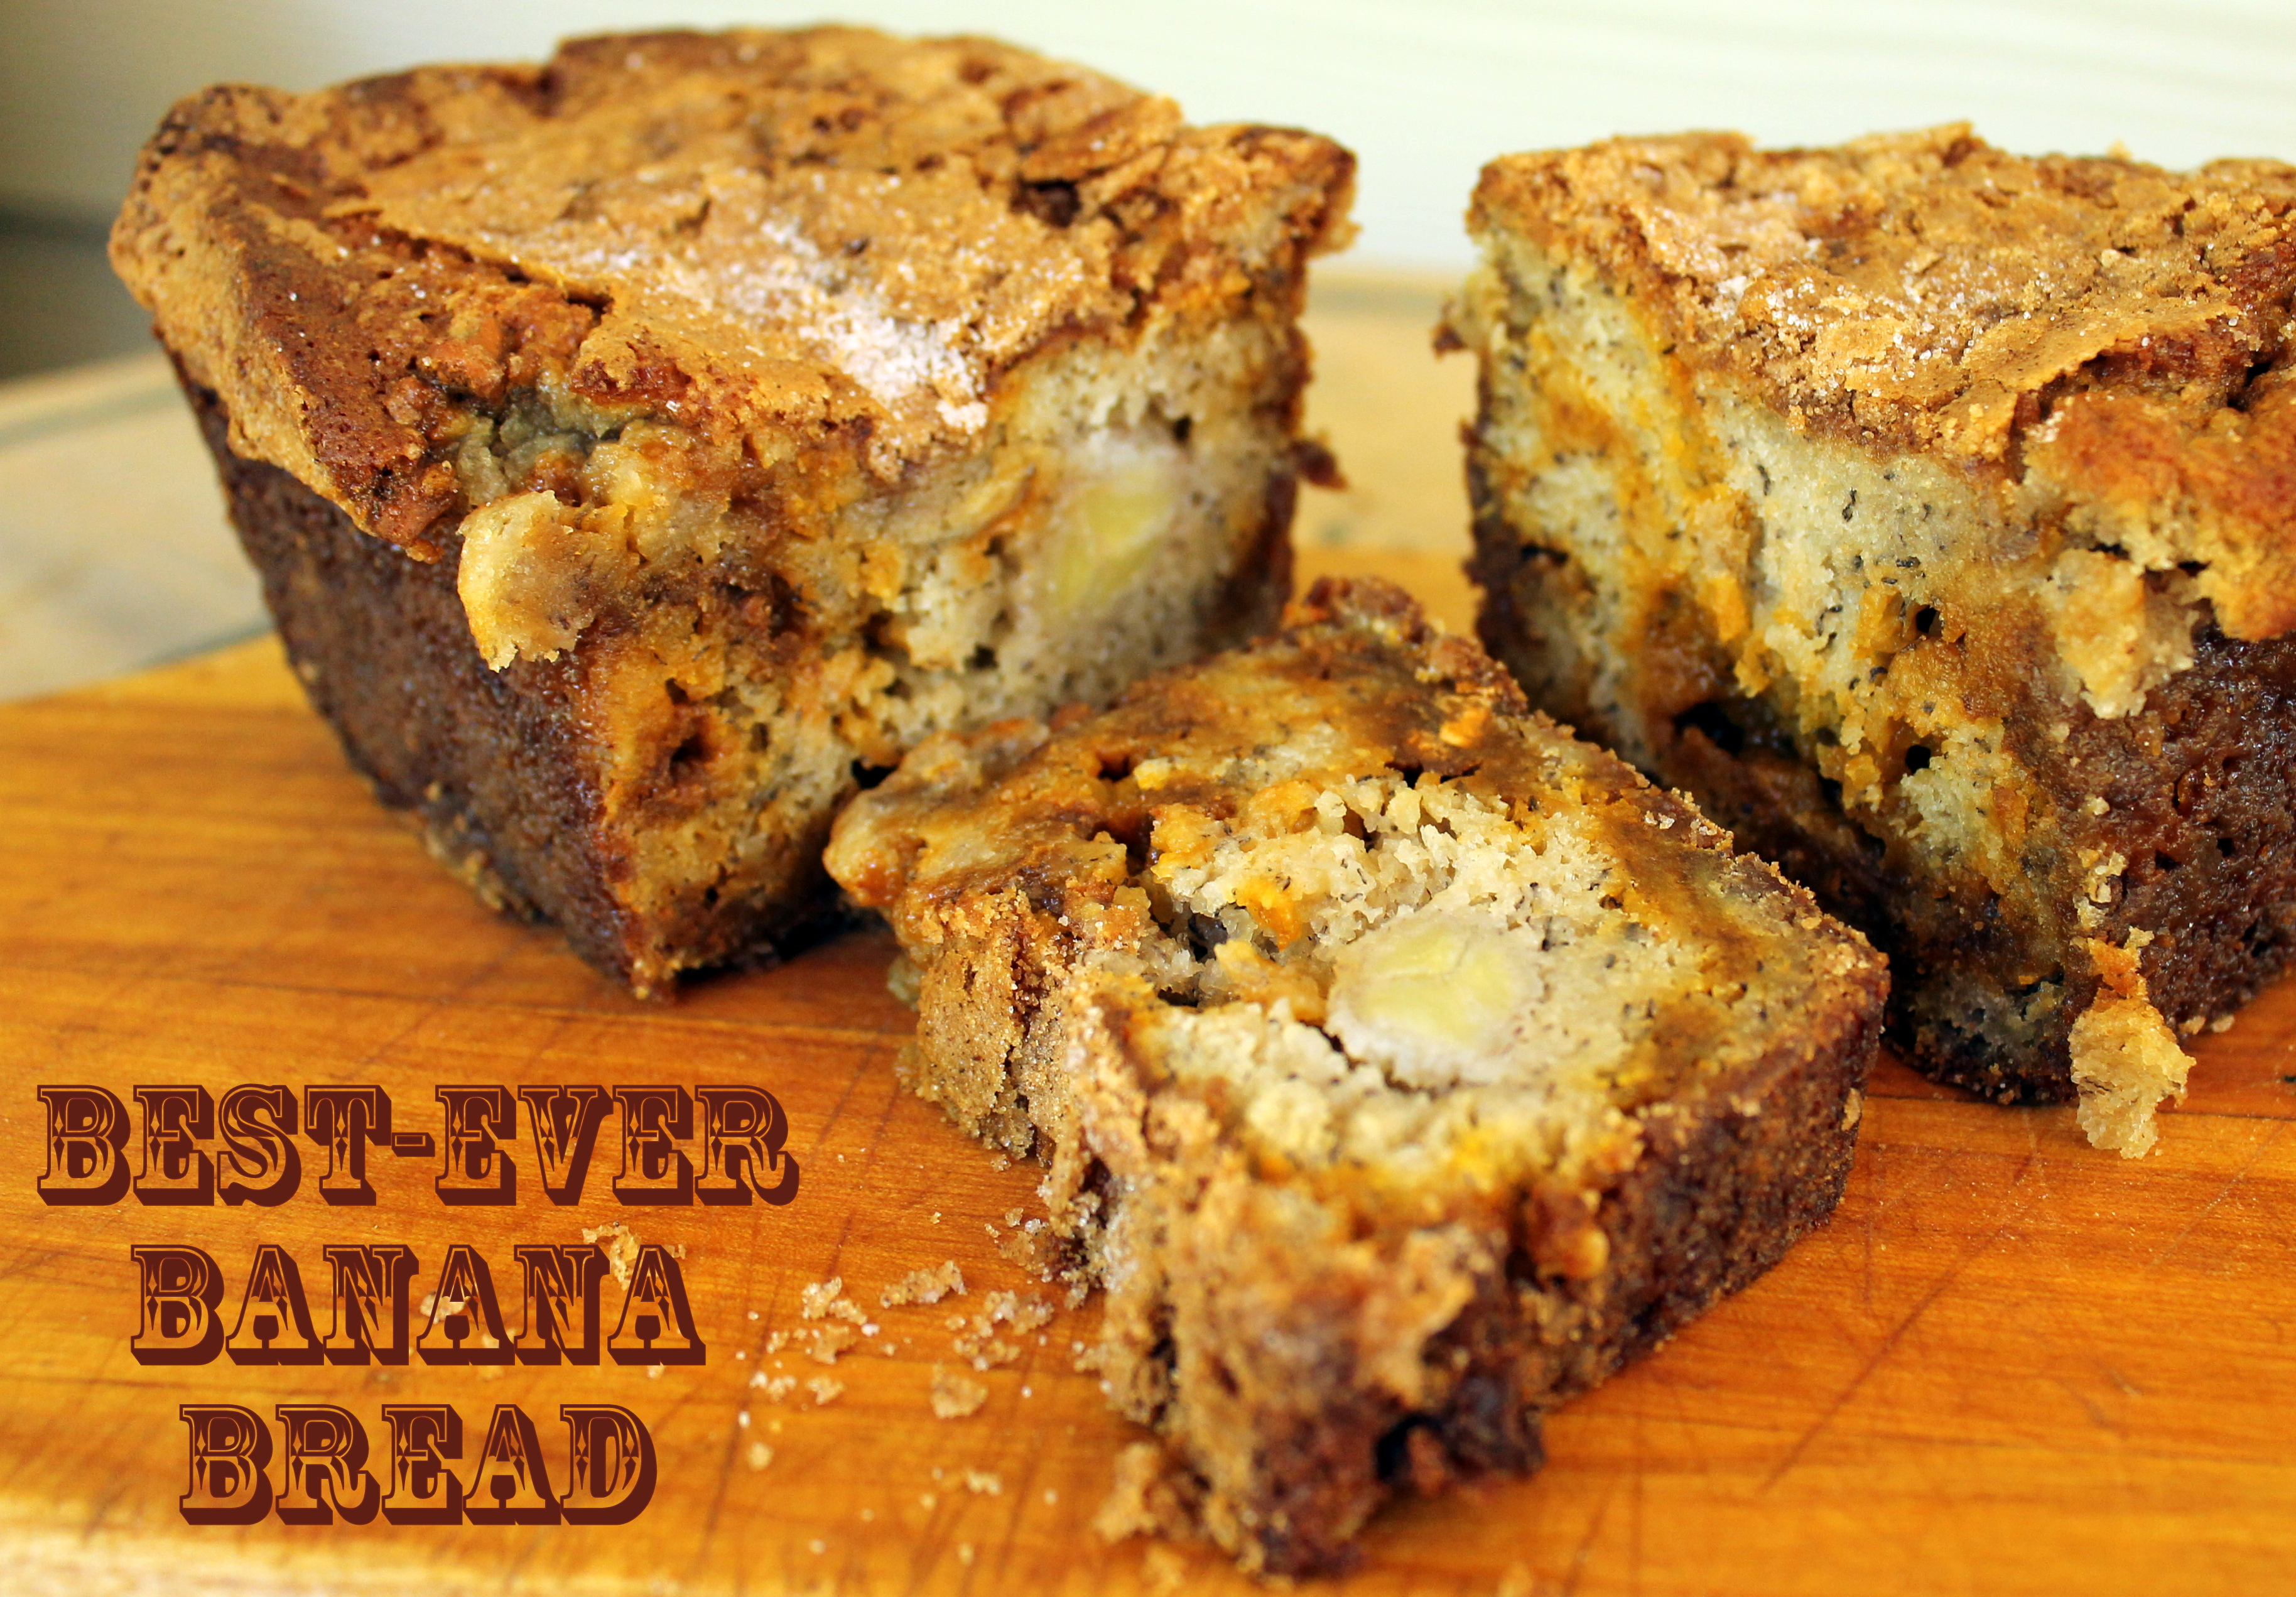 Banana Bread The Creative Life In Between